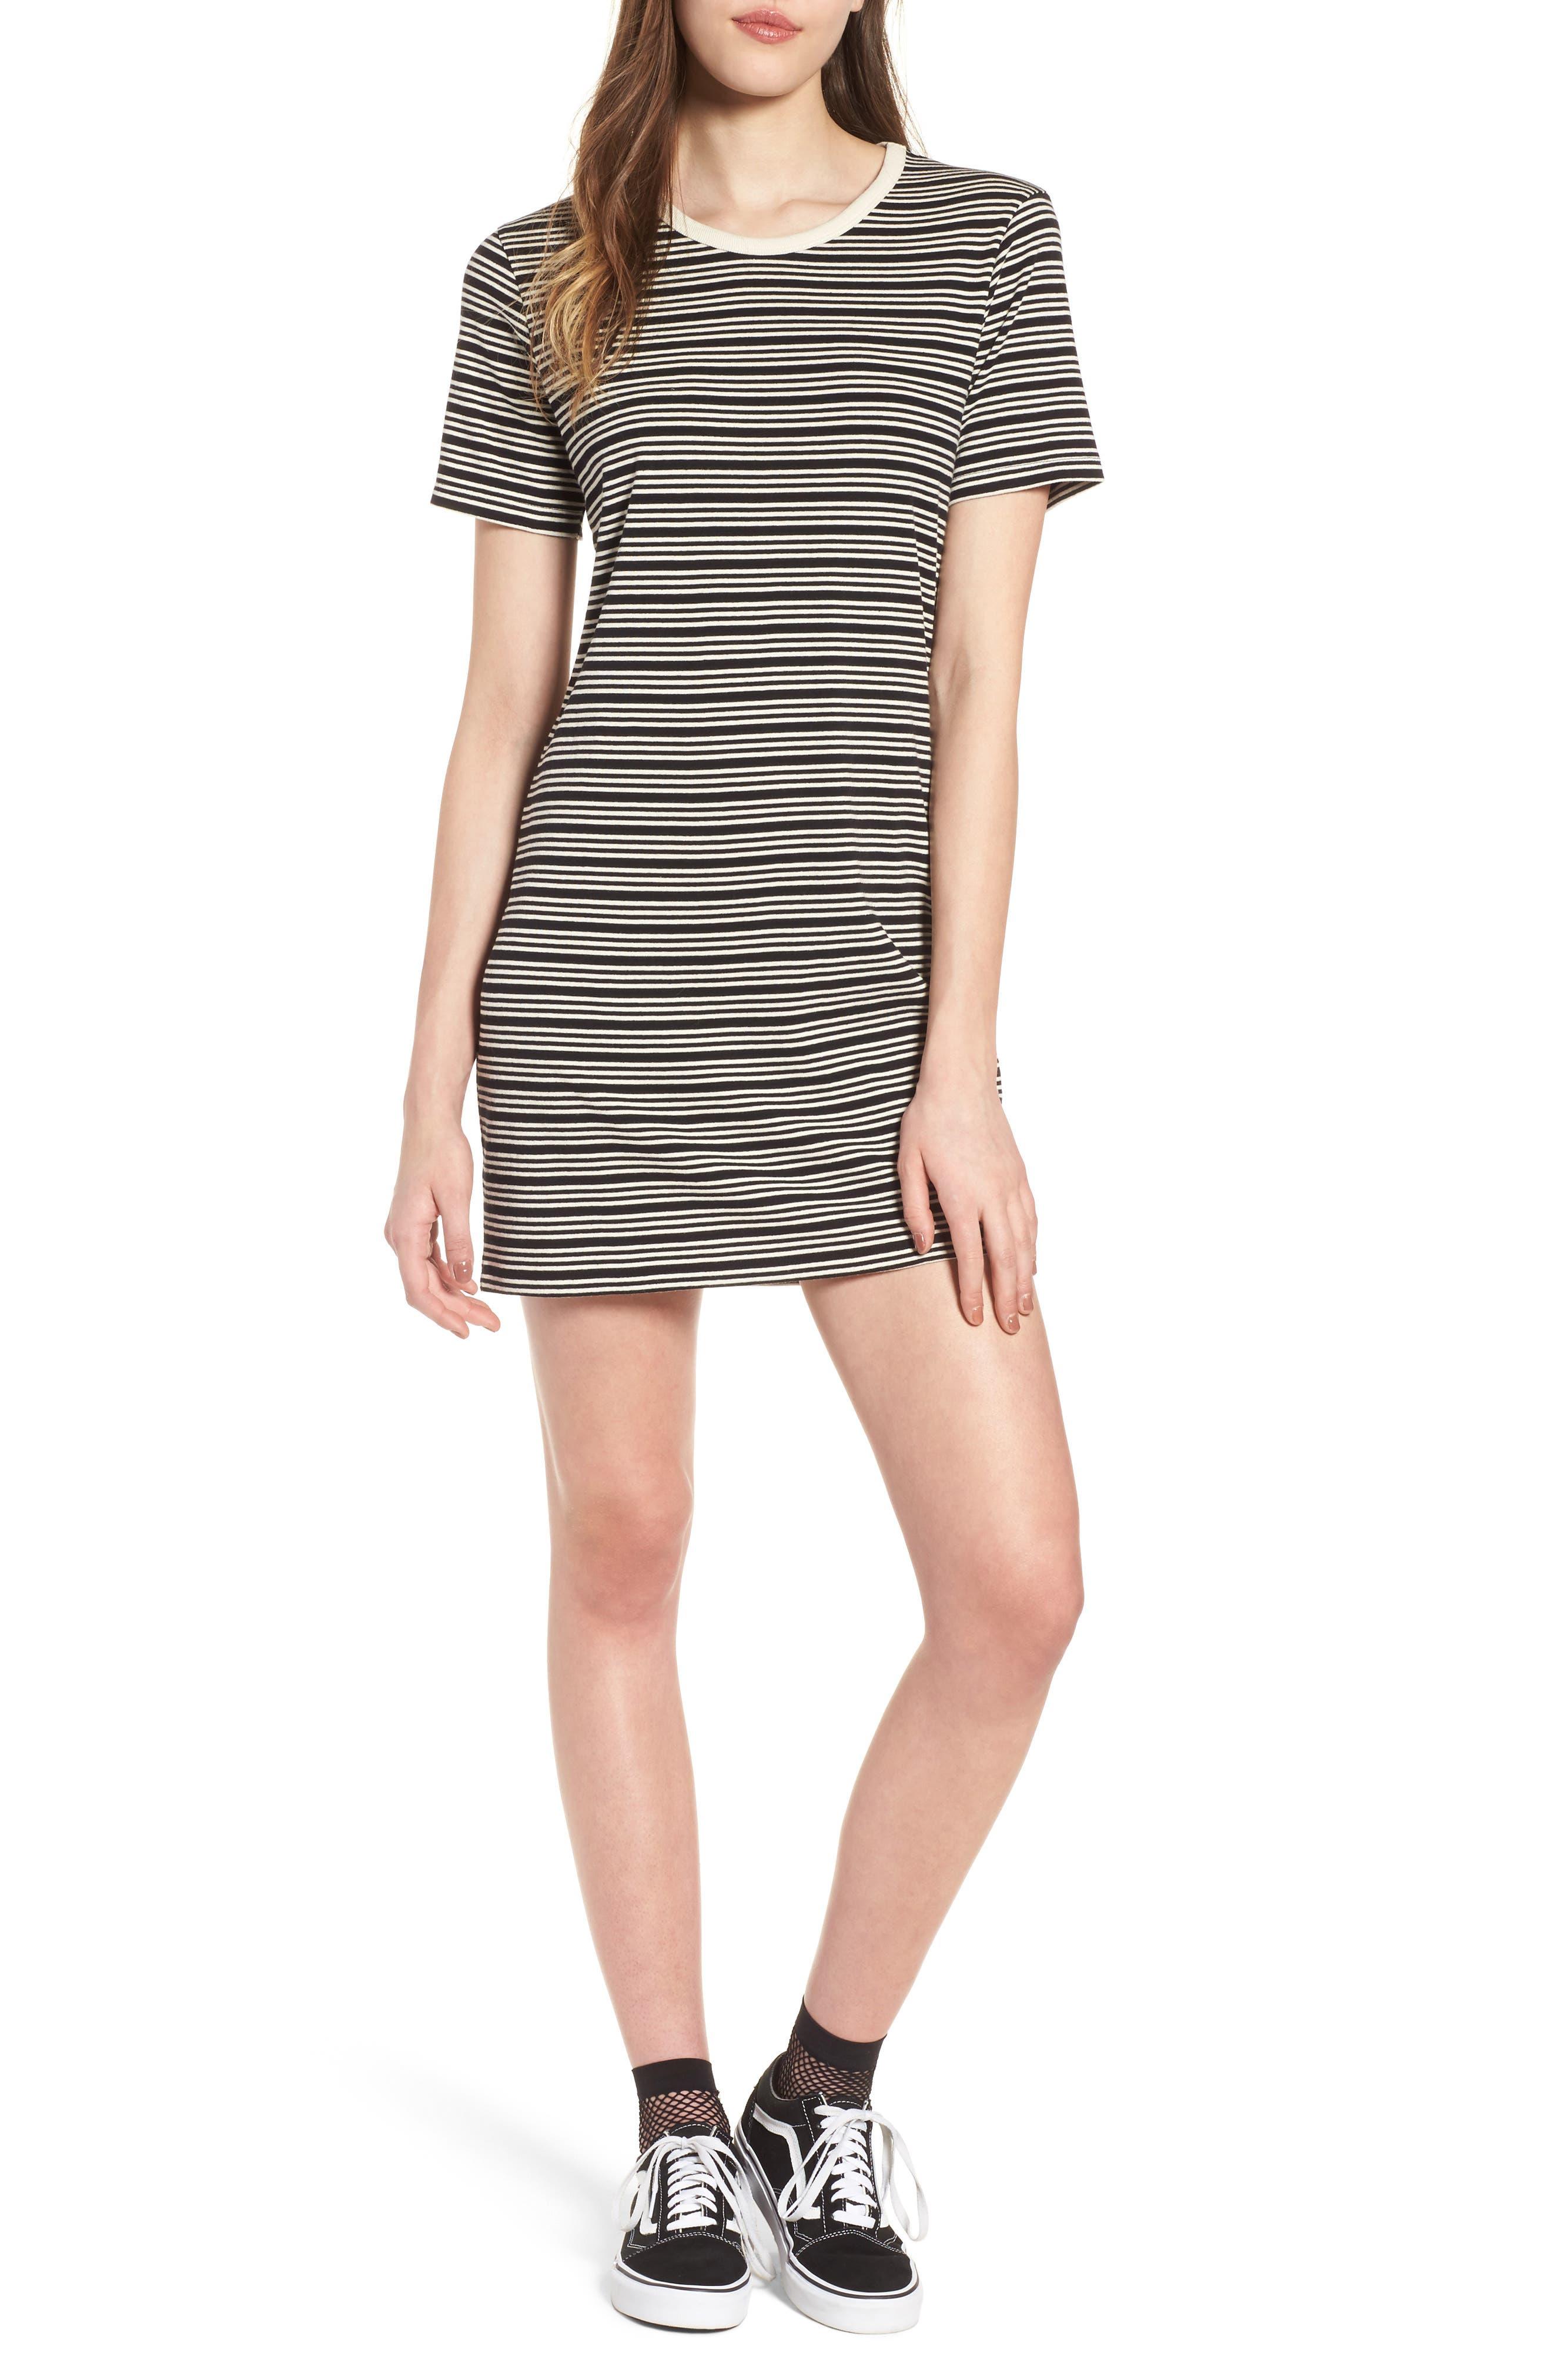 Alternate Image 1 Selected - Obey Freya Stripe T-Shirt Dress